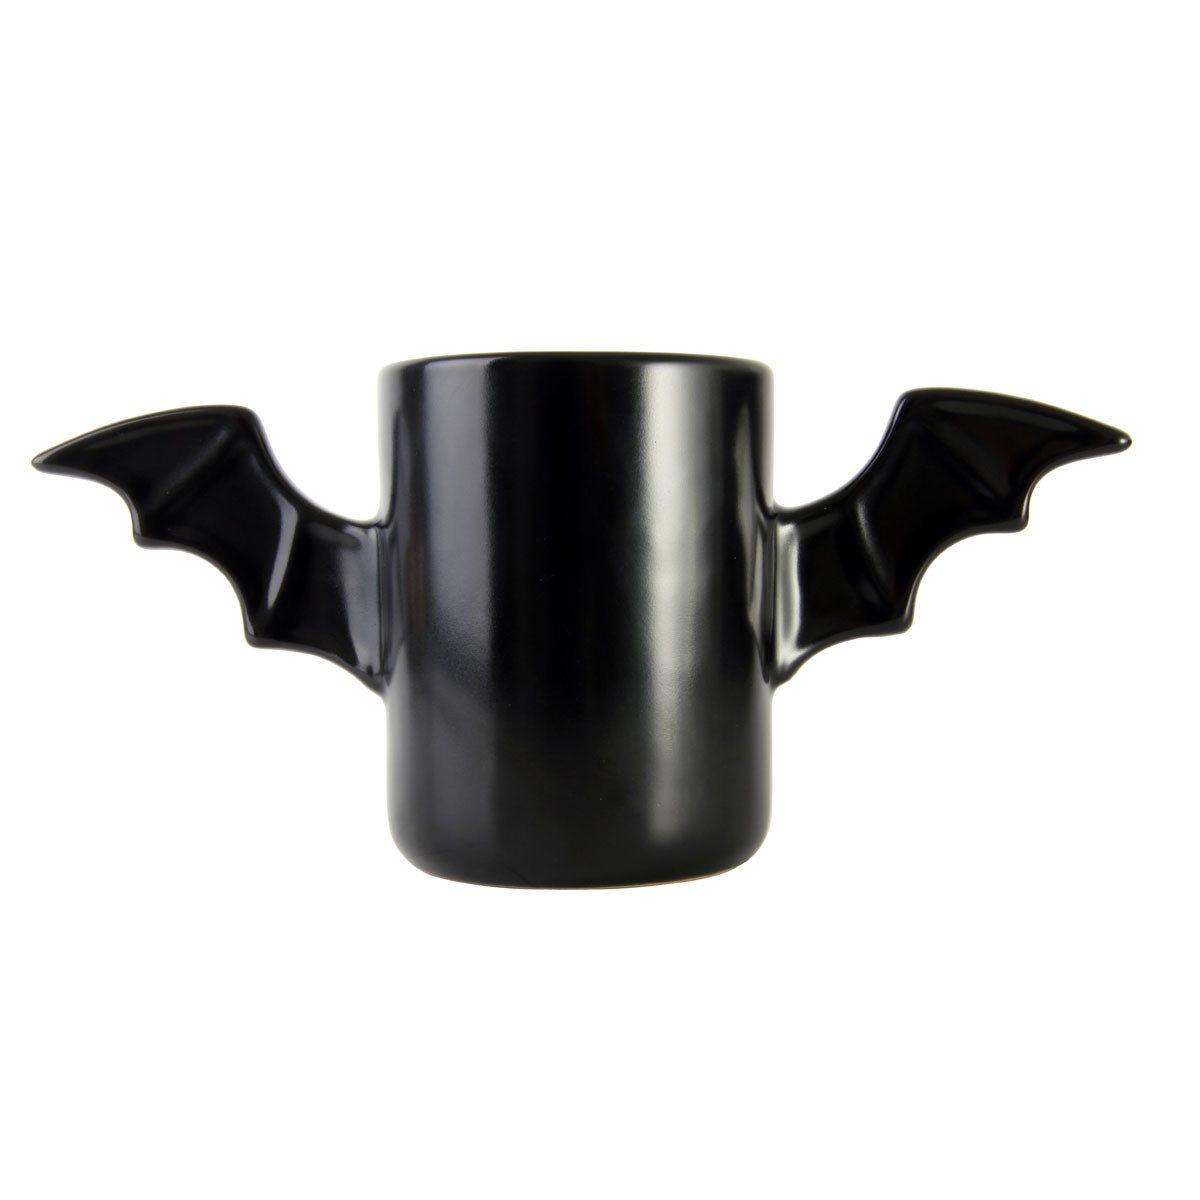 La Bat Taza para incondicionales del Caballero Oscuro